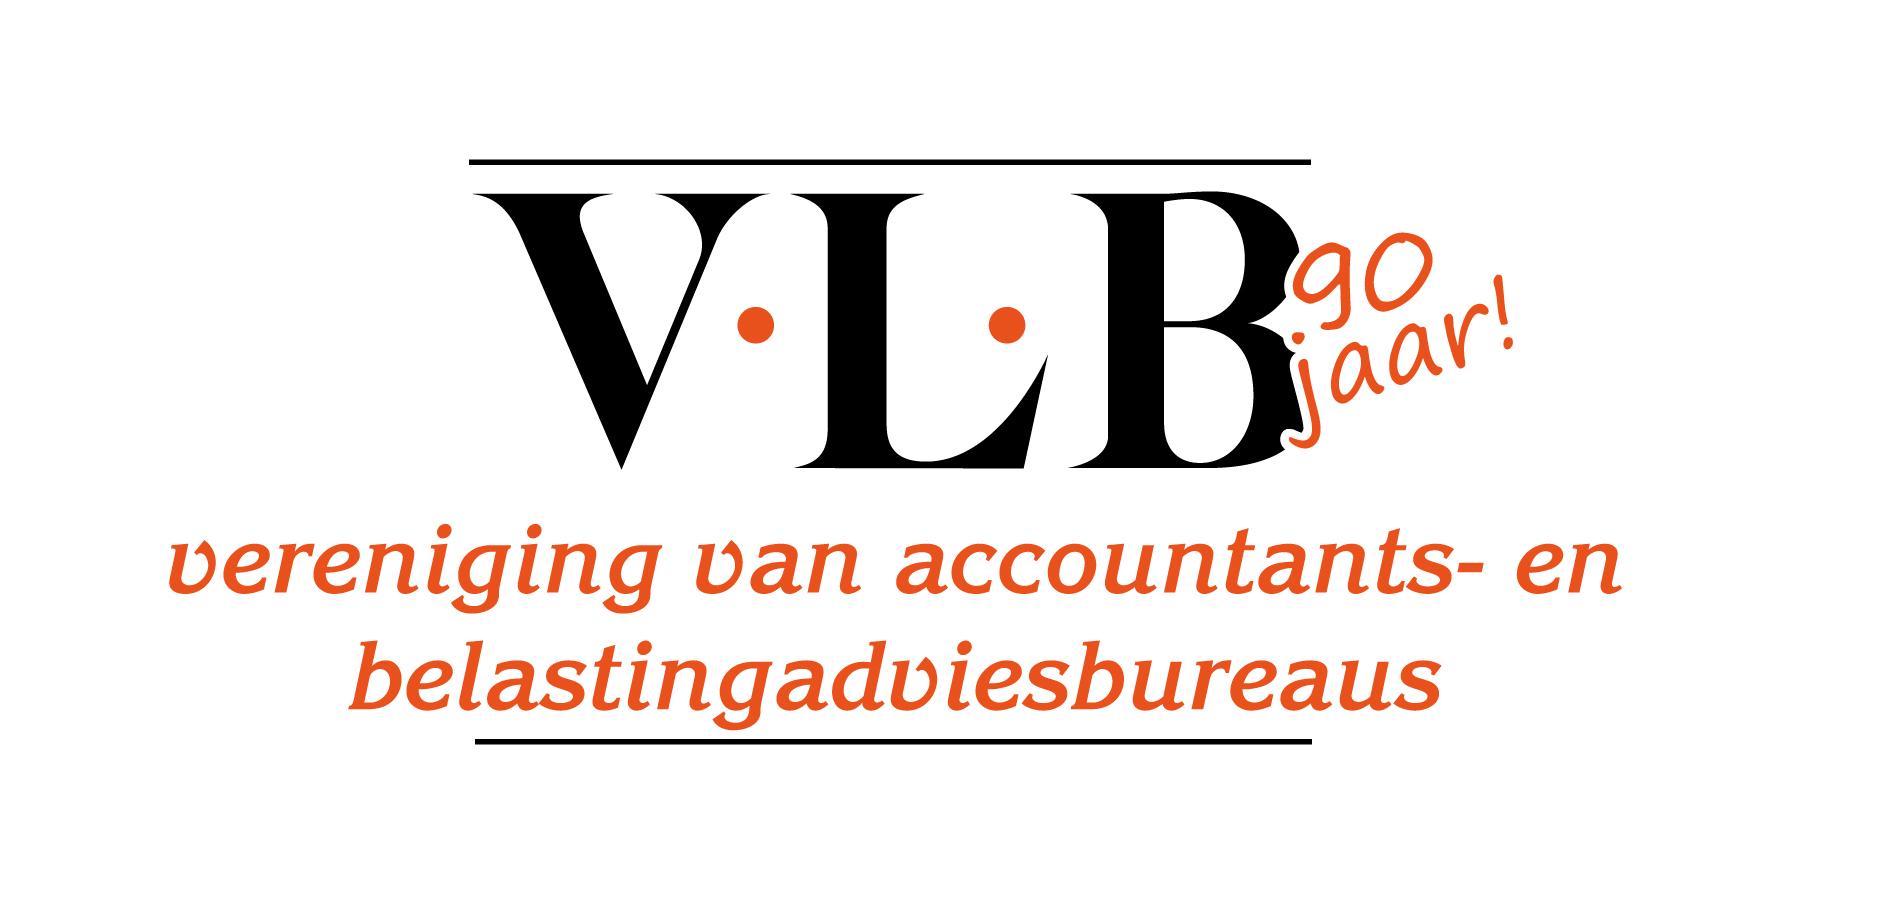 BIJLAGE 9c-1 VLB-logo 90-jaar